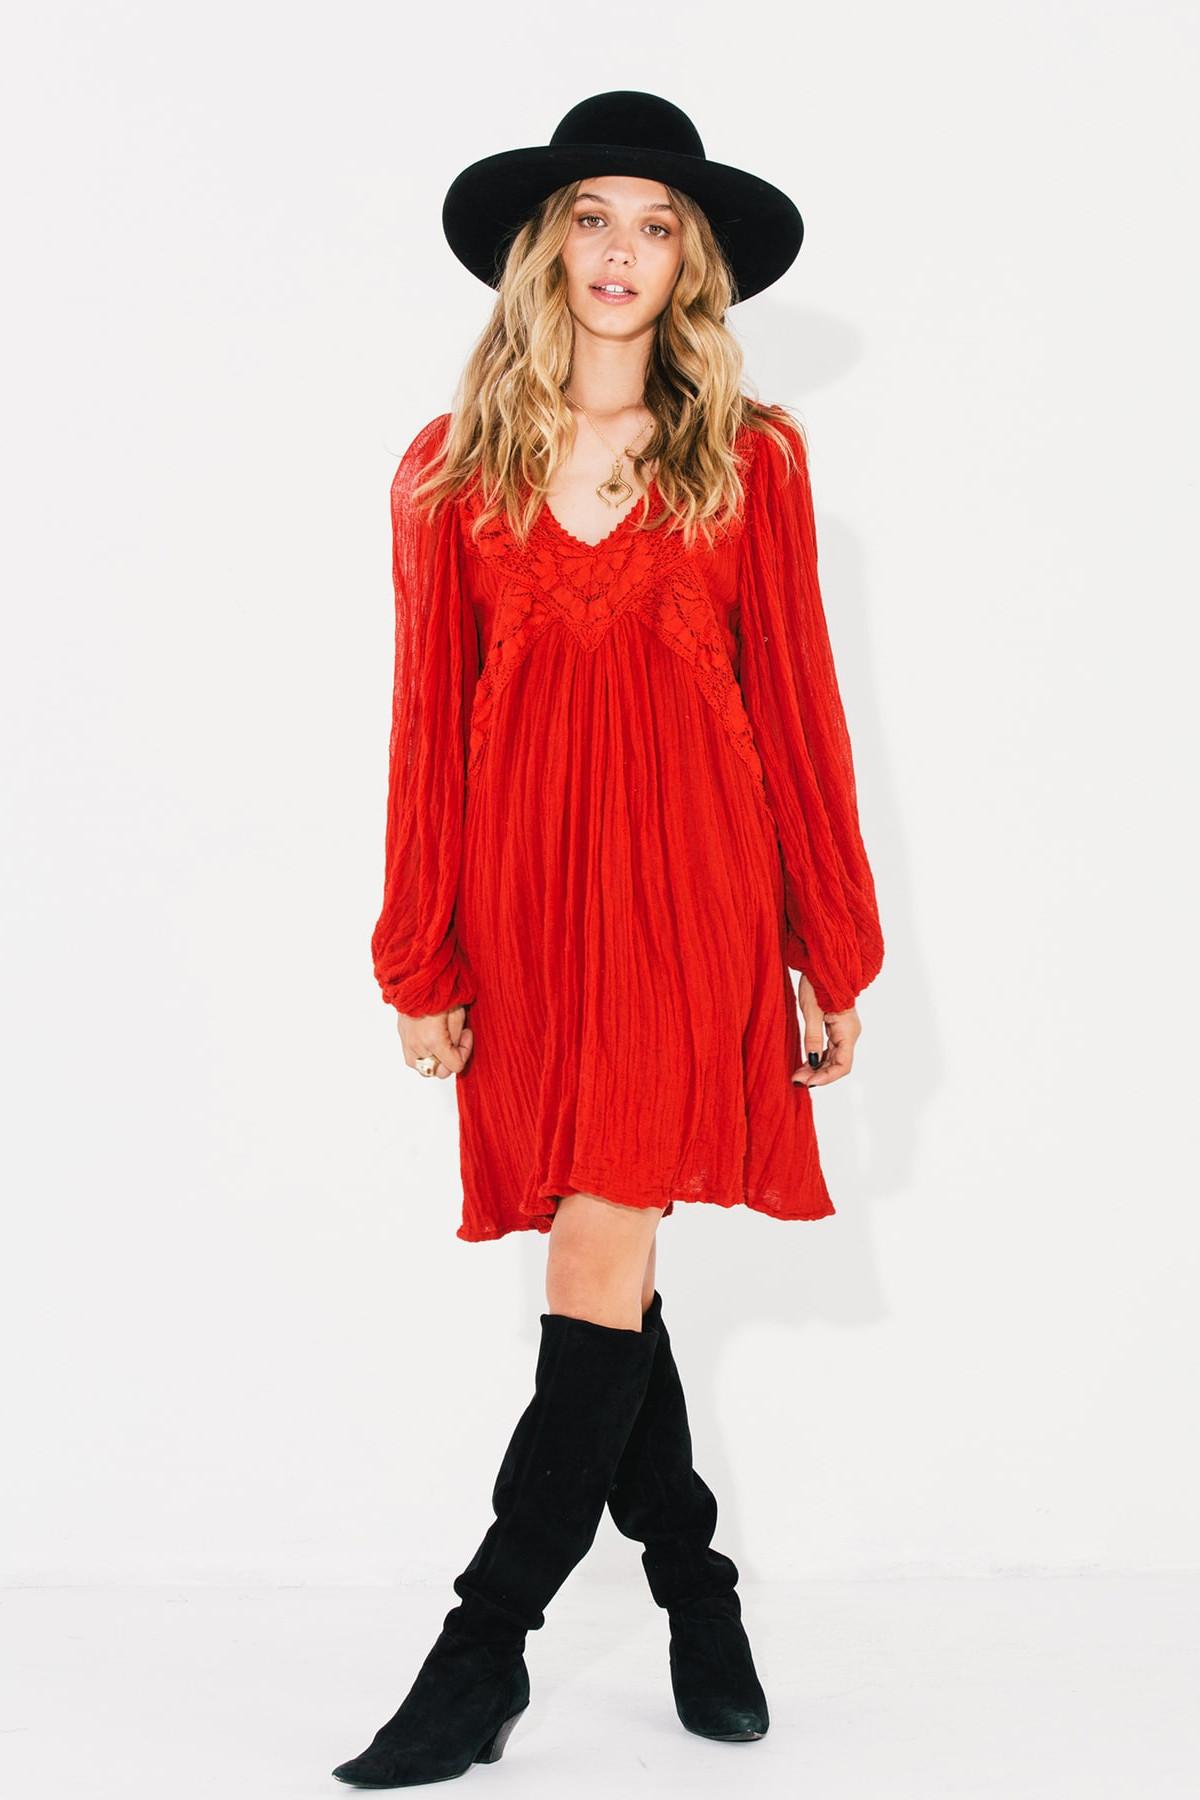 jens-pirate-booty-cordova-dress-red_01-min.jpg